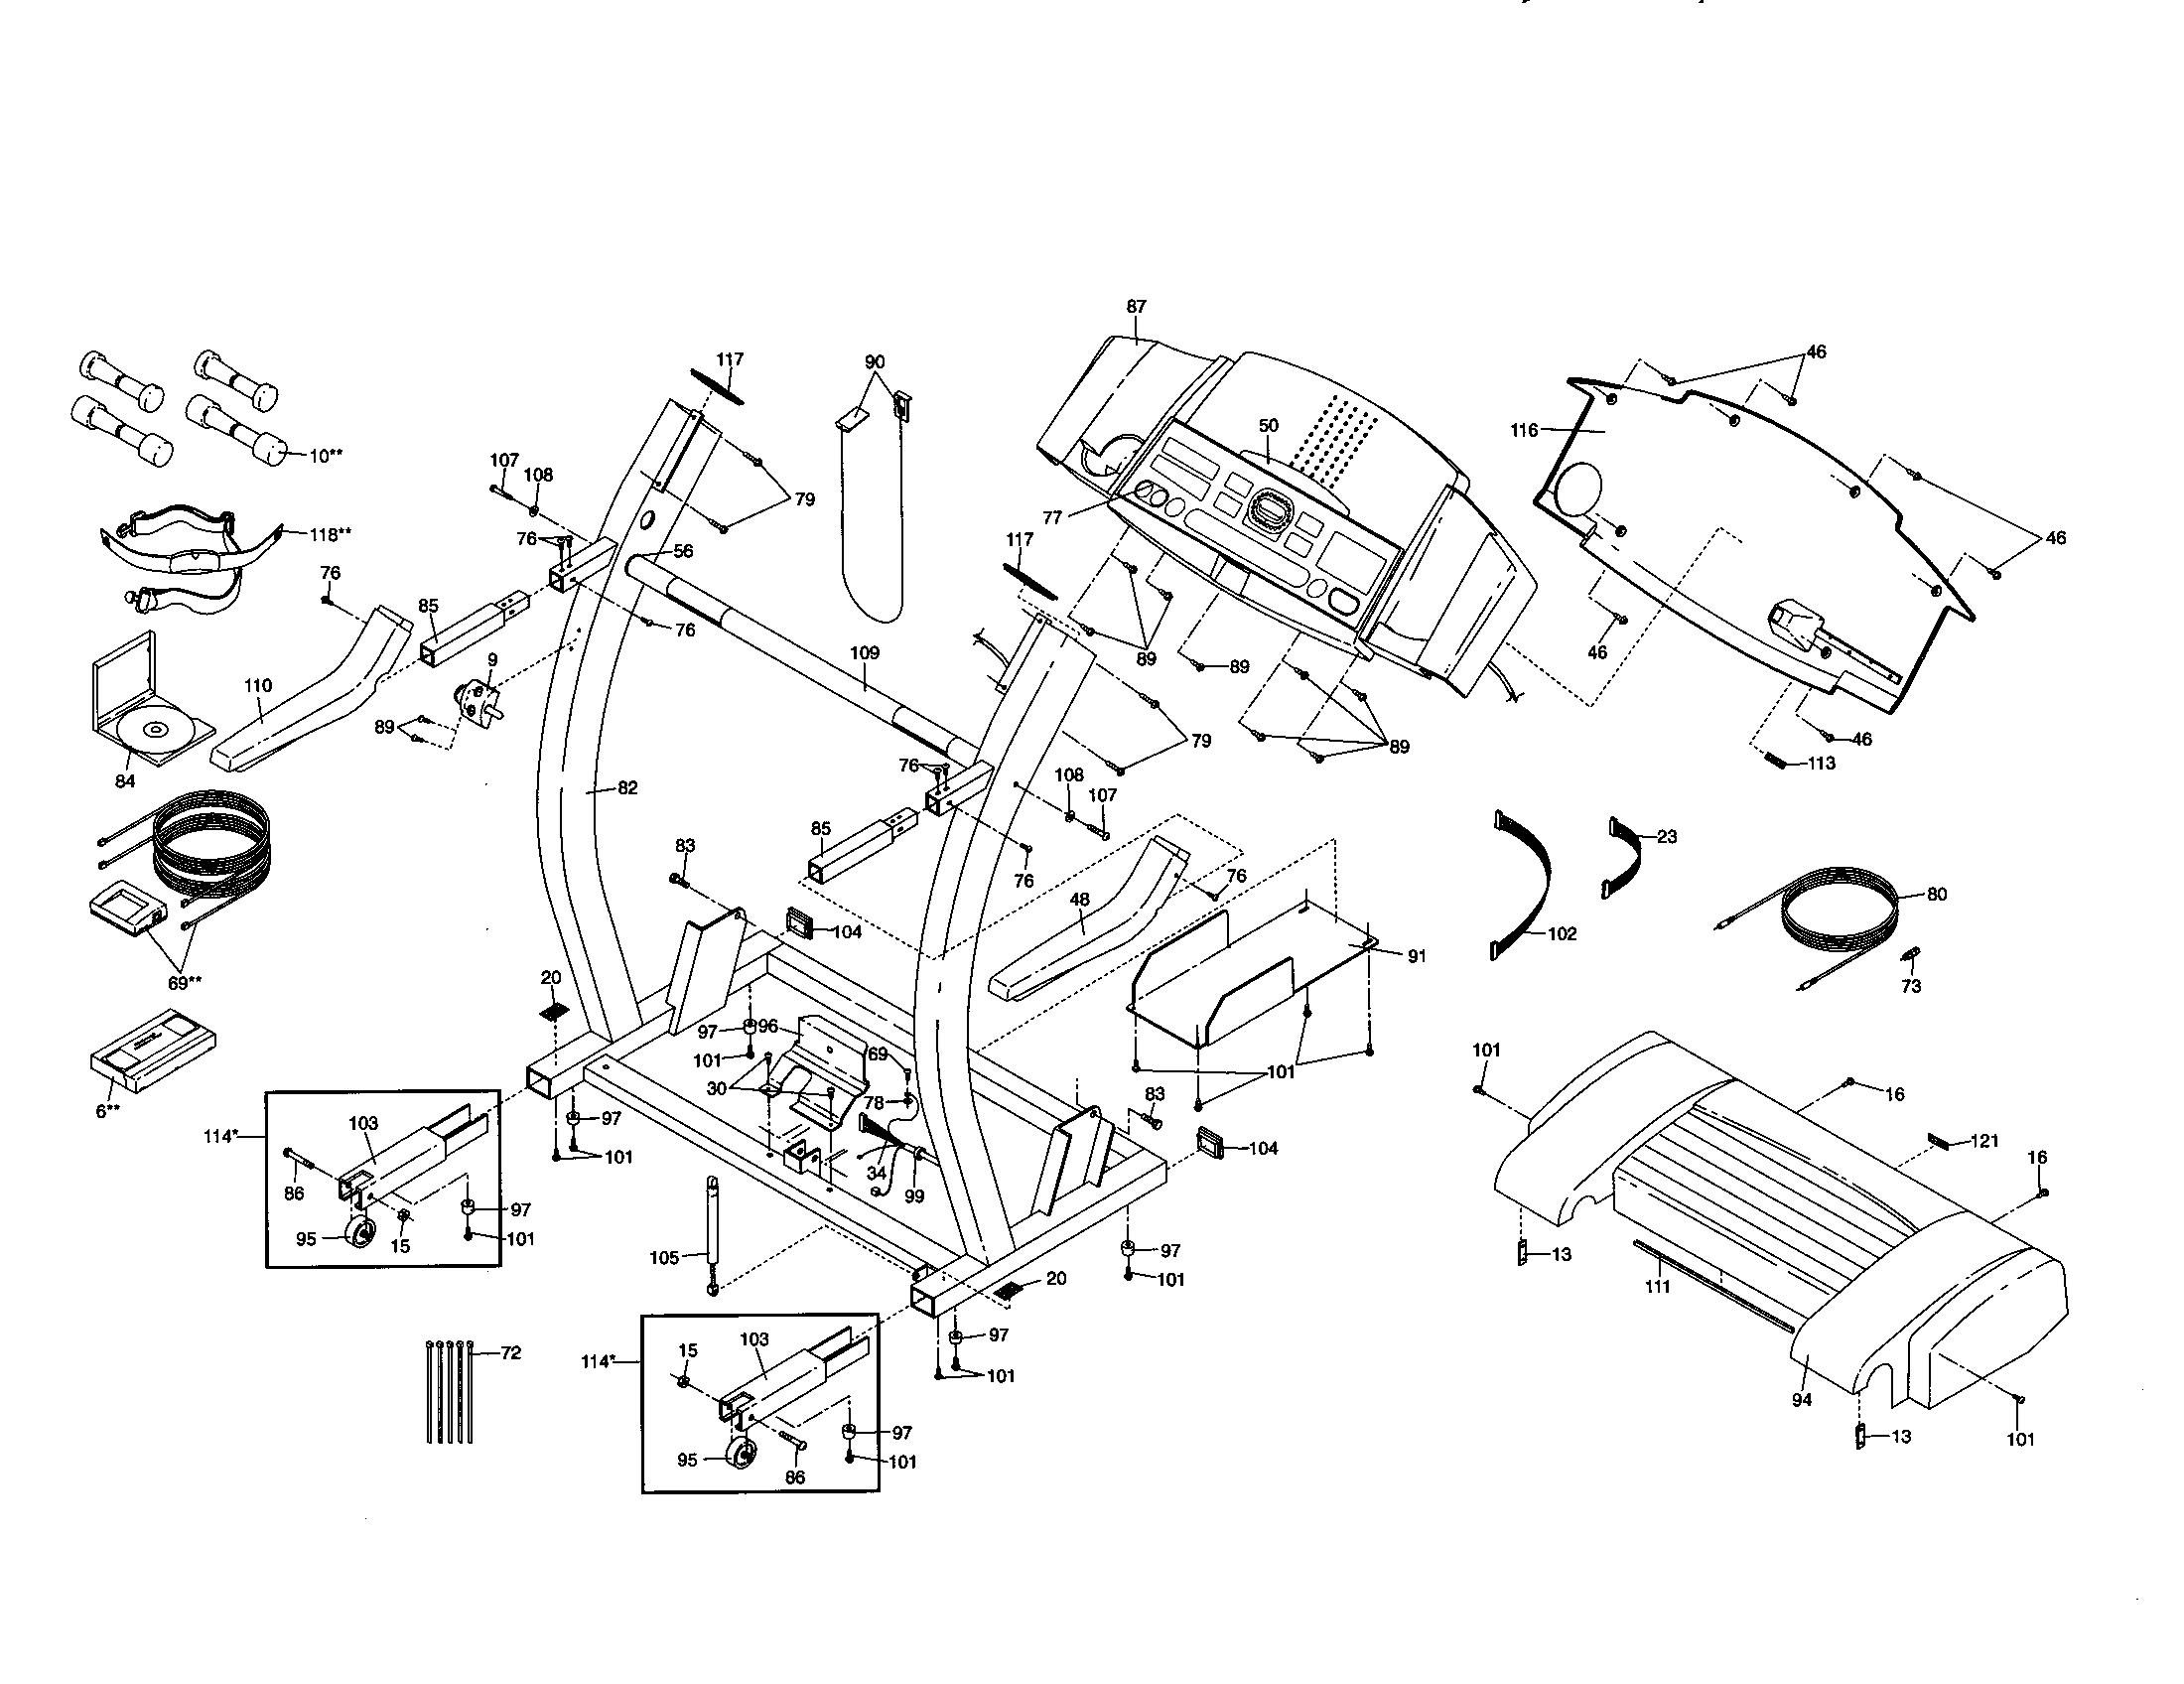 Proform model 831299462 treadmill genuine parts